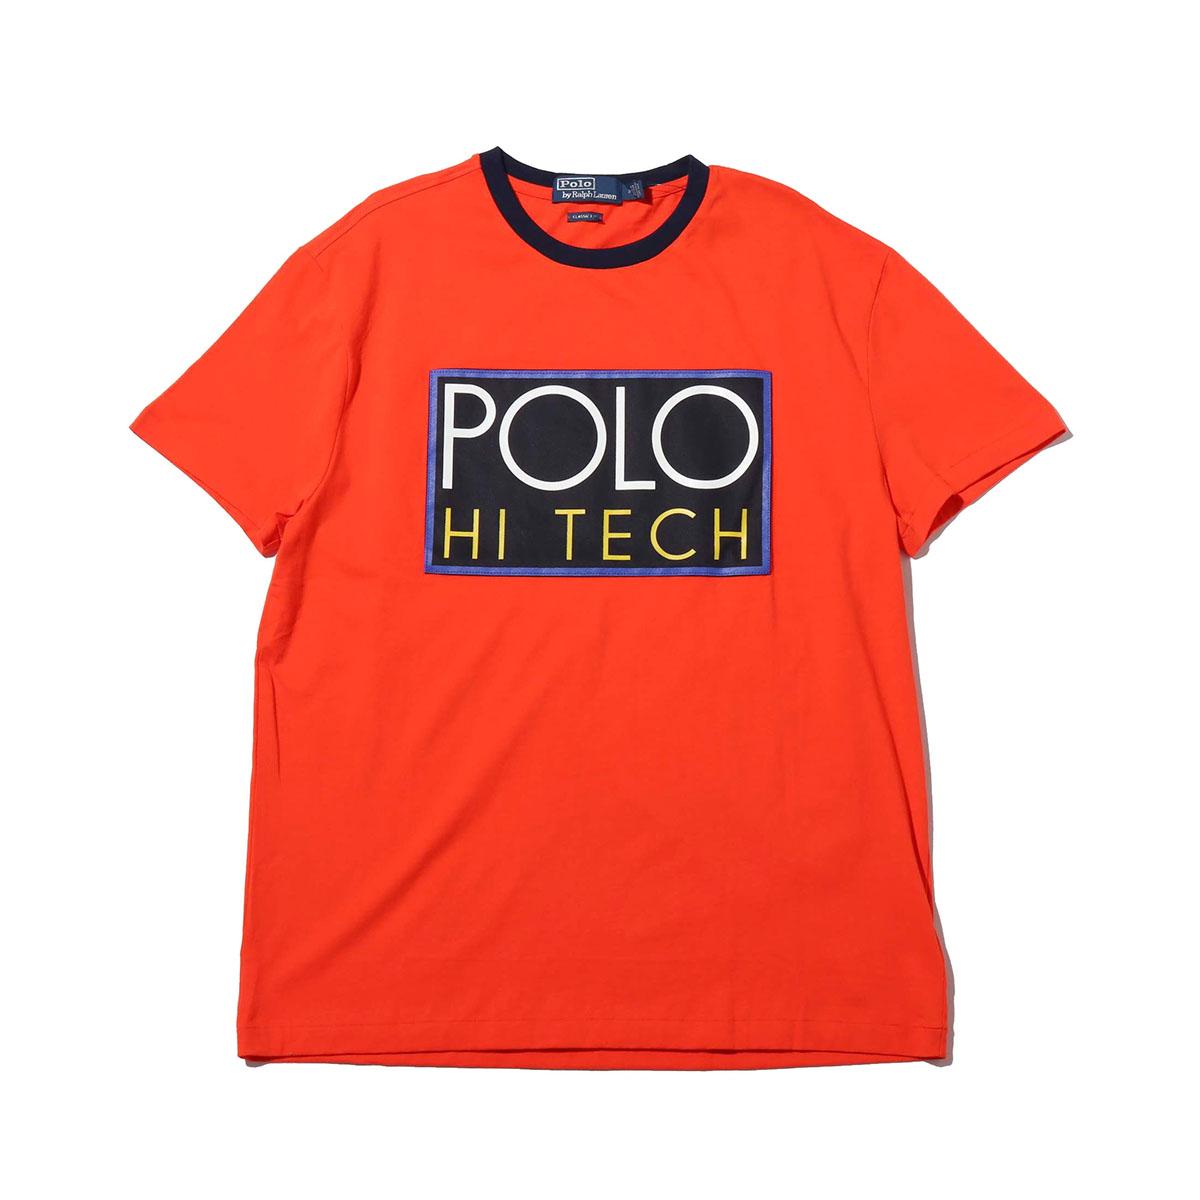 POLO RALPH LAUREN SSCNM1-SHORT SLEEVE-T-SHIRT(ポロ ラルフローレン SSCNM1 ショートスリーブ Tシャツ)ORANGE【メンズ 半袖Tシャツ】18HO-I